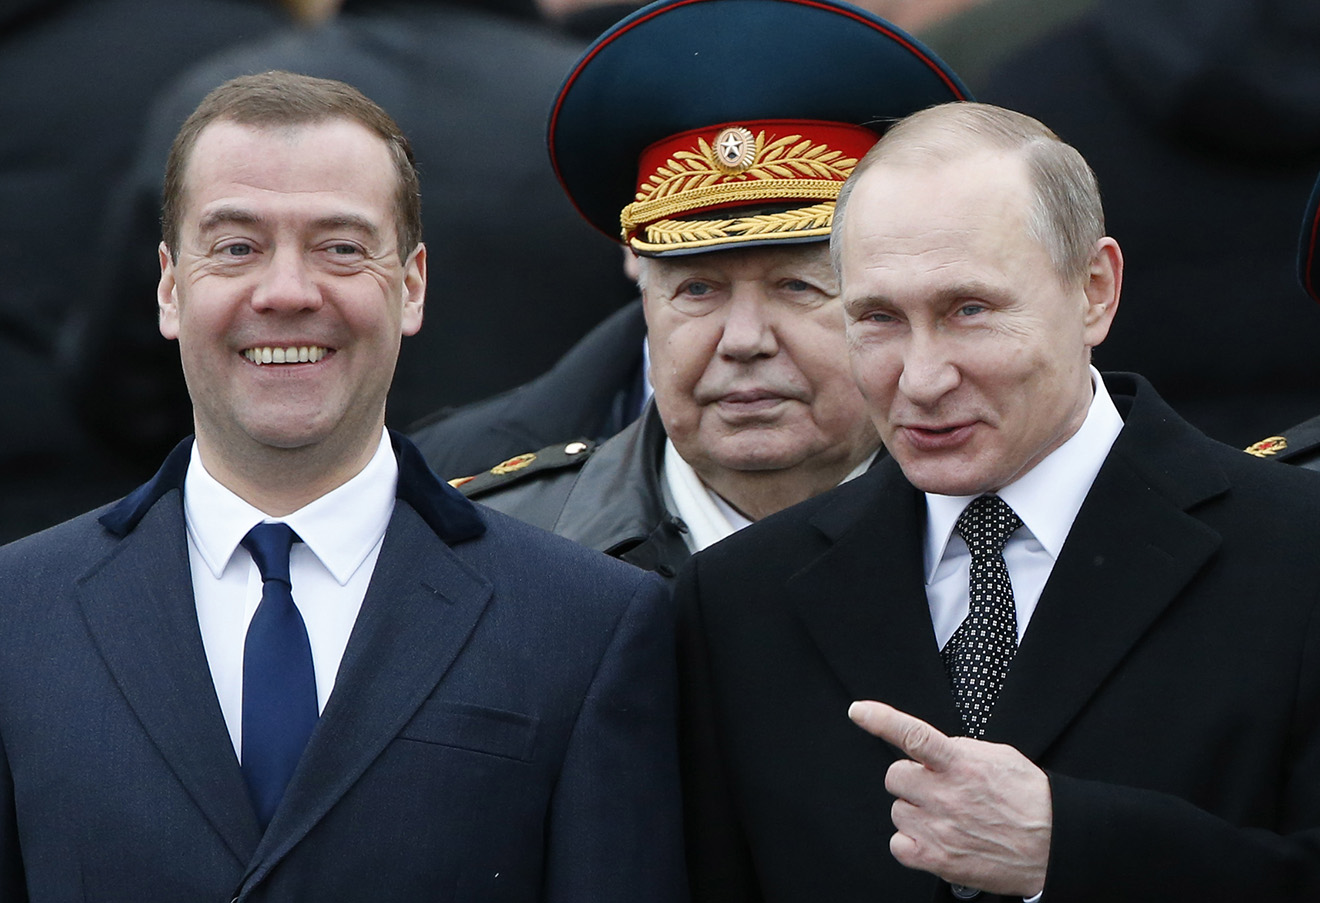 Дмитрий Медведев и Владимир Путин. Фото: Сергей Карпухин / Reuters